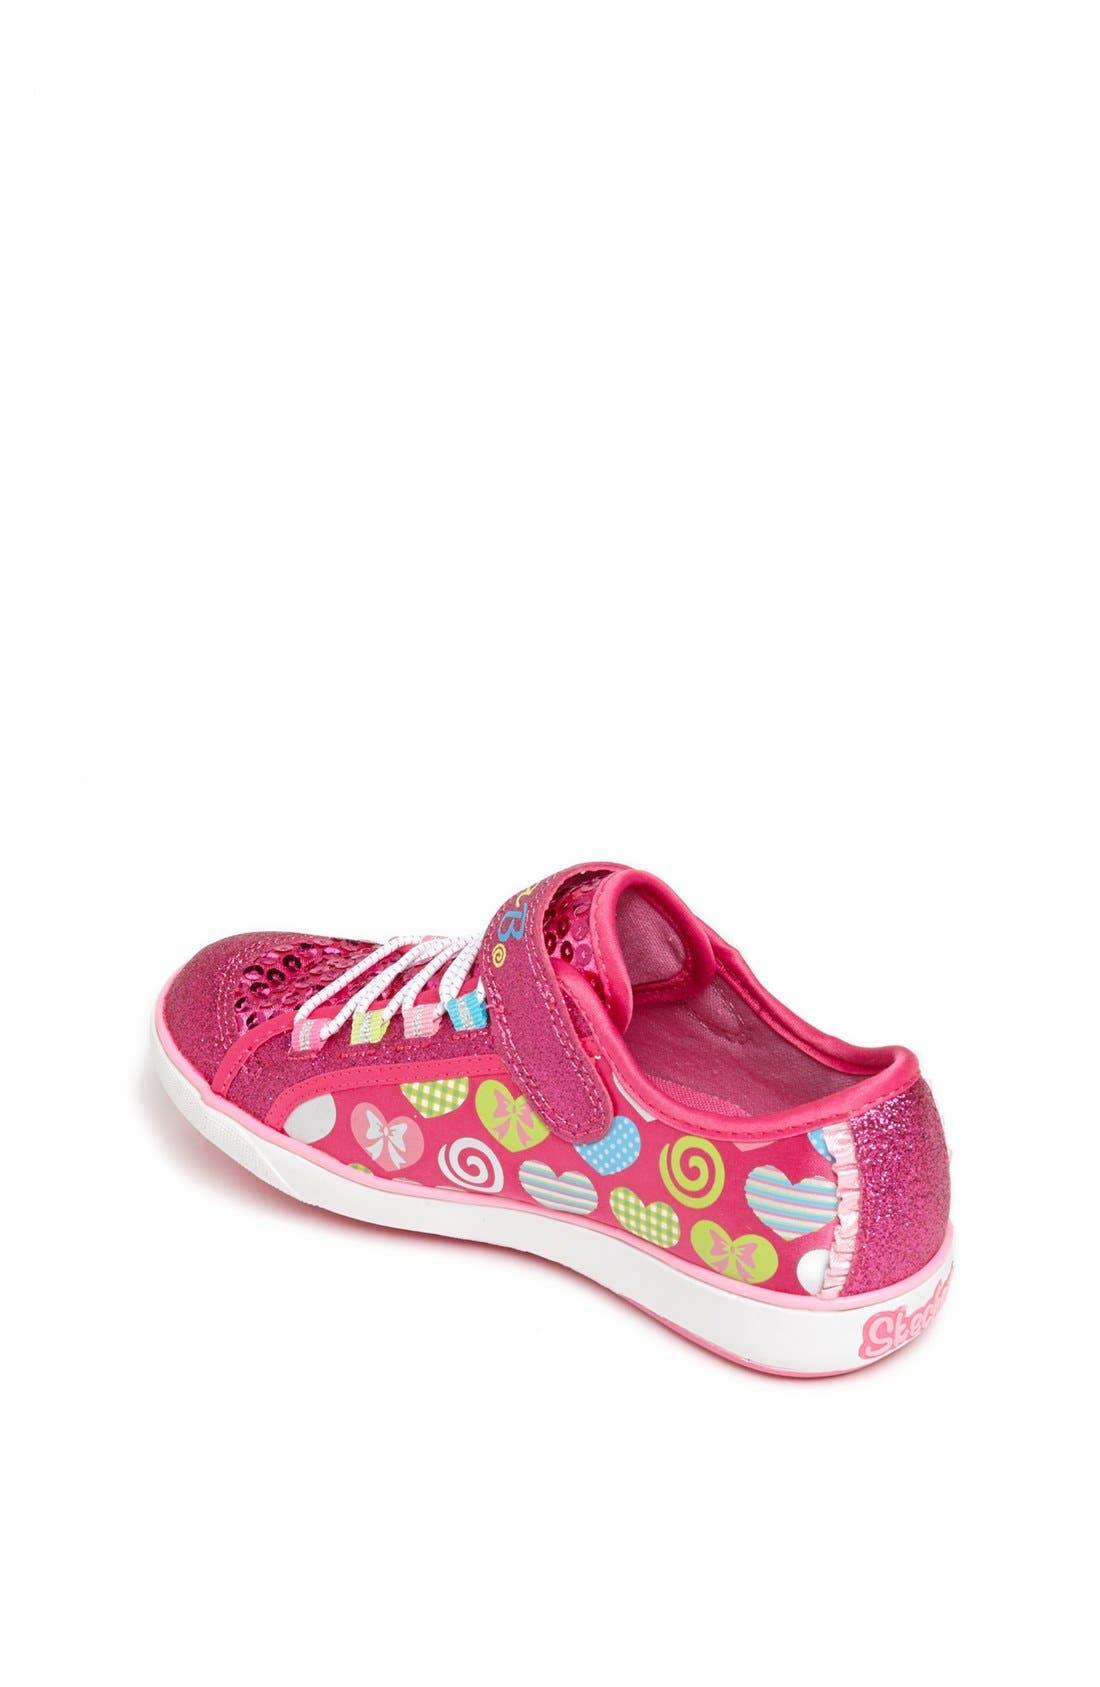 Alternate Image 2  - SKECHERS 'Bella Ballerina - Curtsies' Sneaker (Toddler, Little Kid & Big Kid)